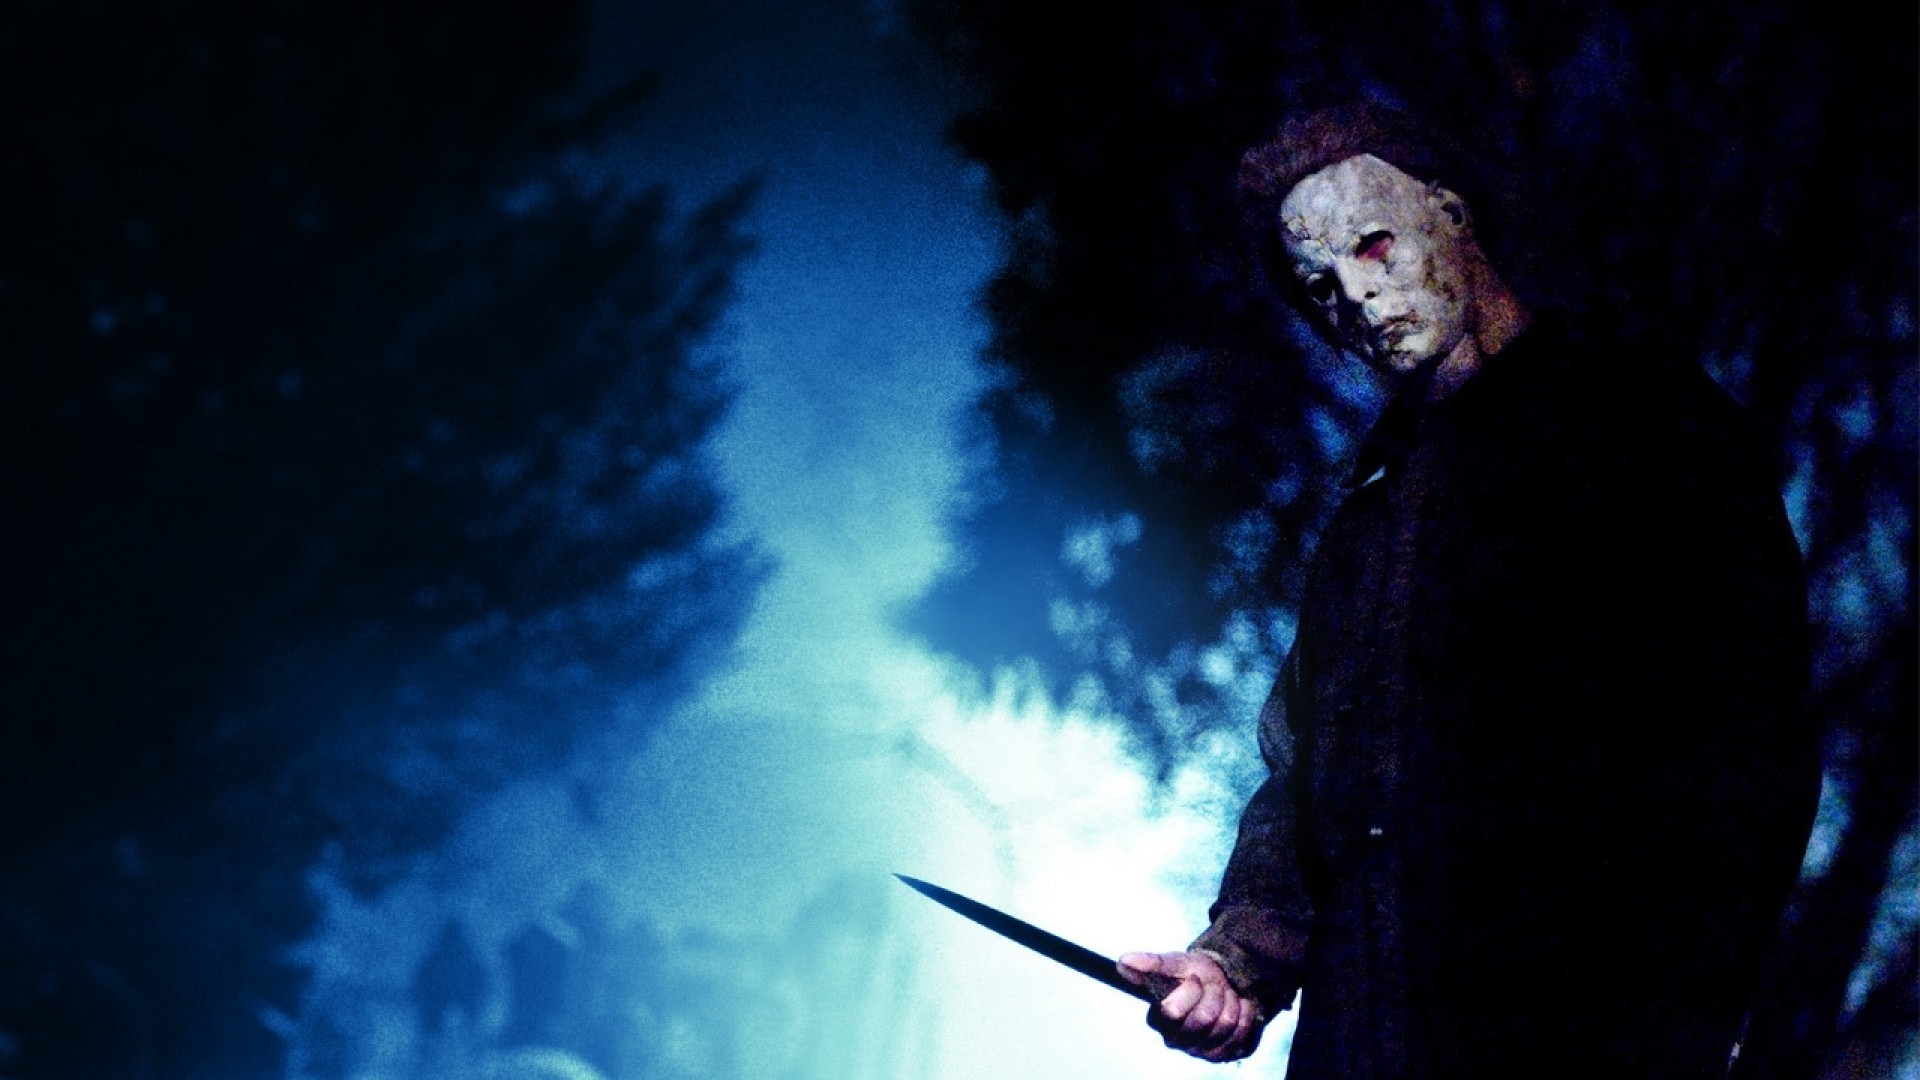 Preview wallpaper michael myers, maniac, killer, knife, mask, fear, horror